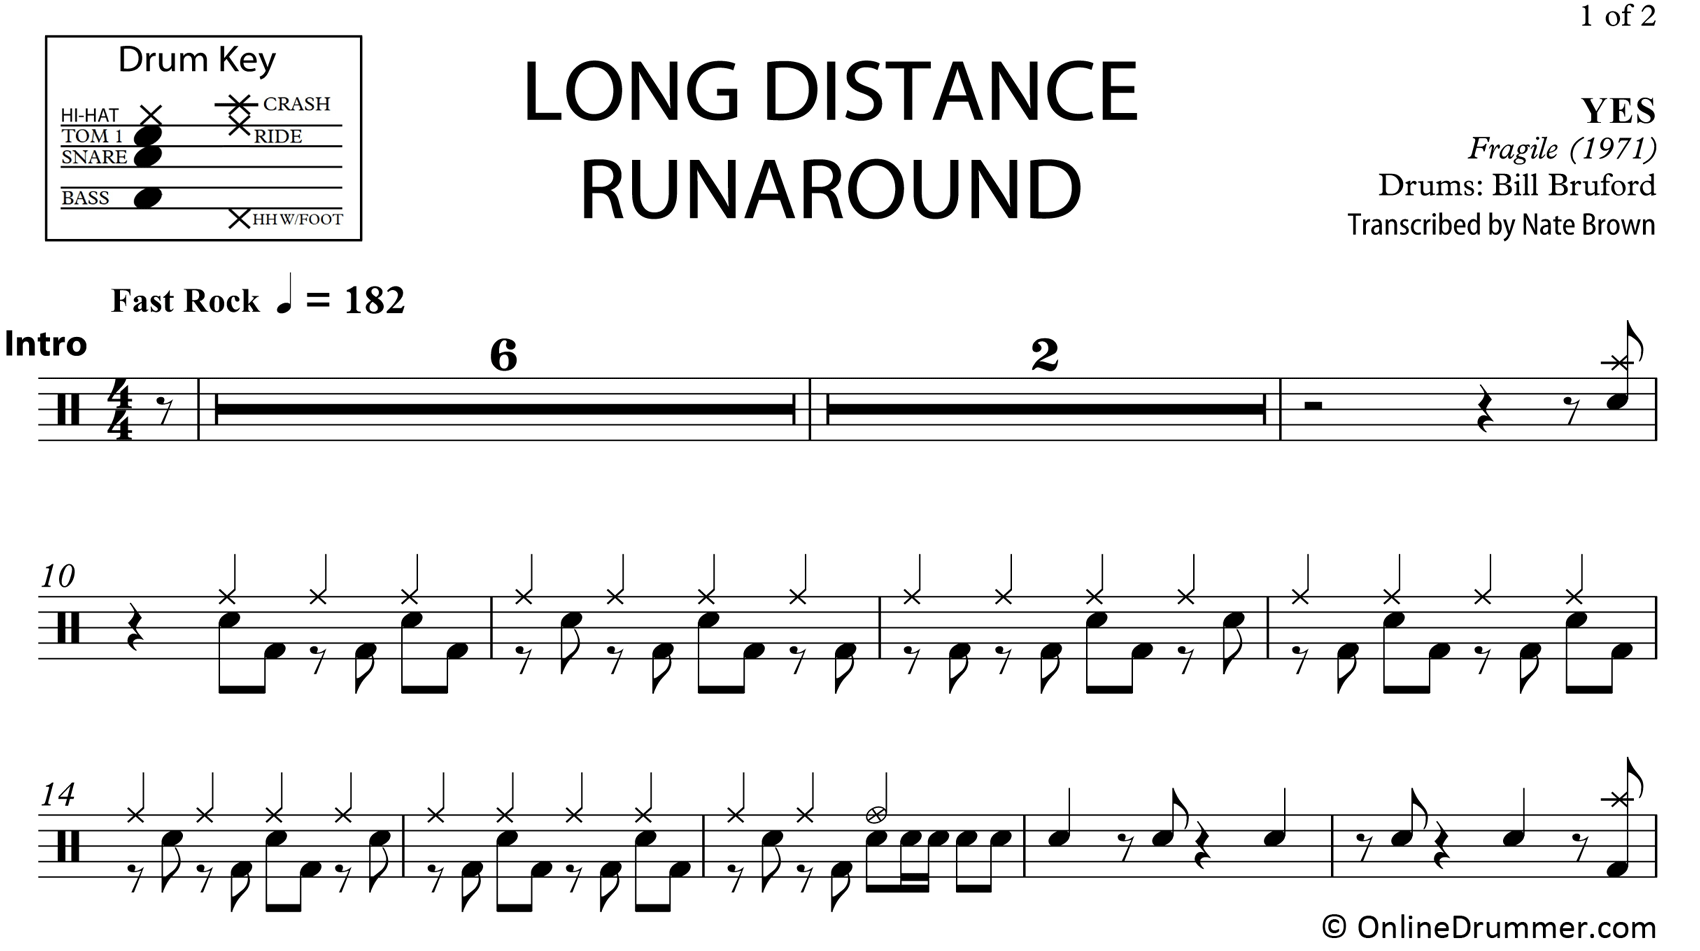 Long Distance Runaround - Yes - Drum Sheet Music